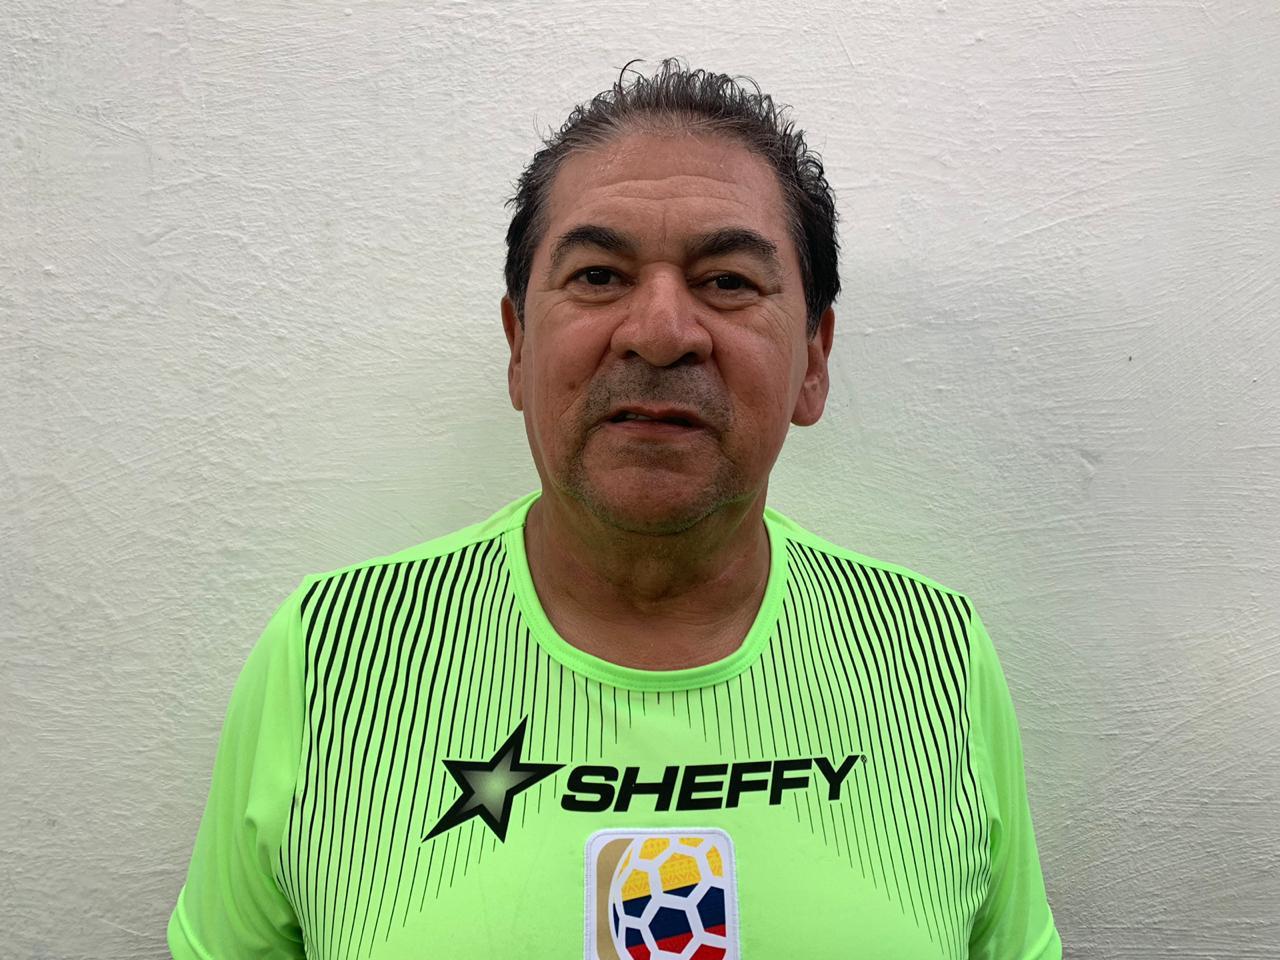 Hugo Fernando Arce Mendoza